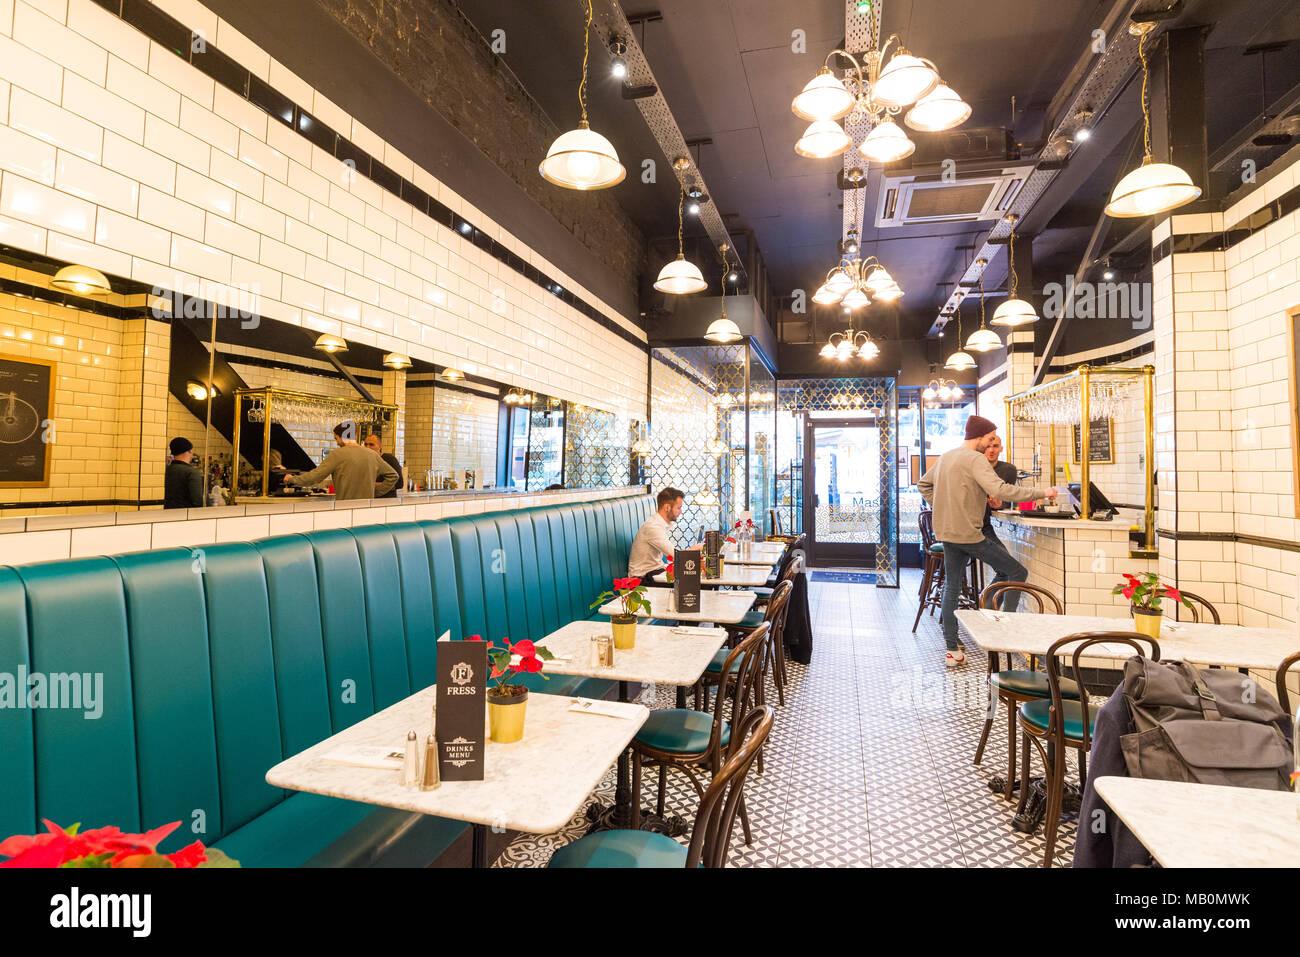 Fress Cafe, Oldham Street, Northern Quarter, Manchester, UK - Stock Image